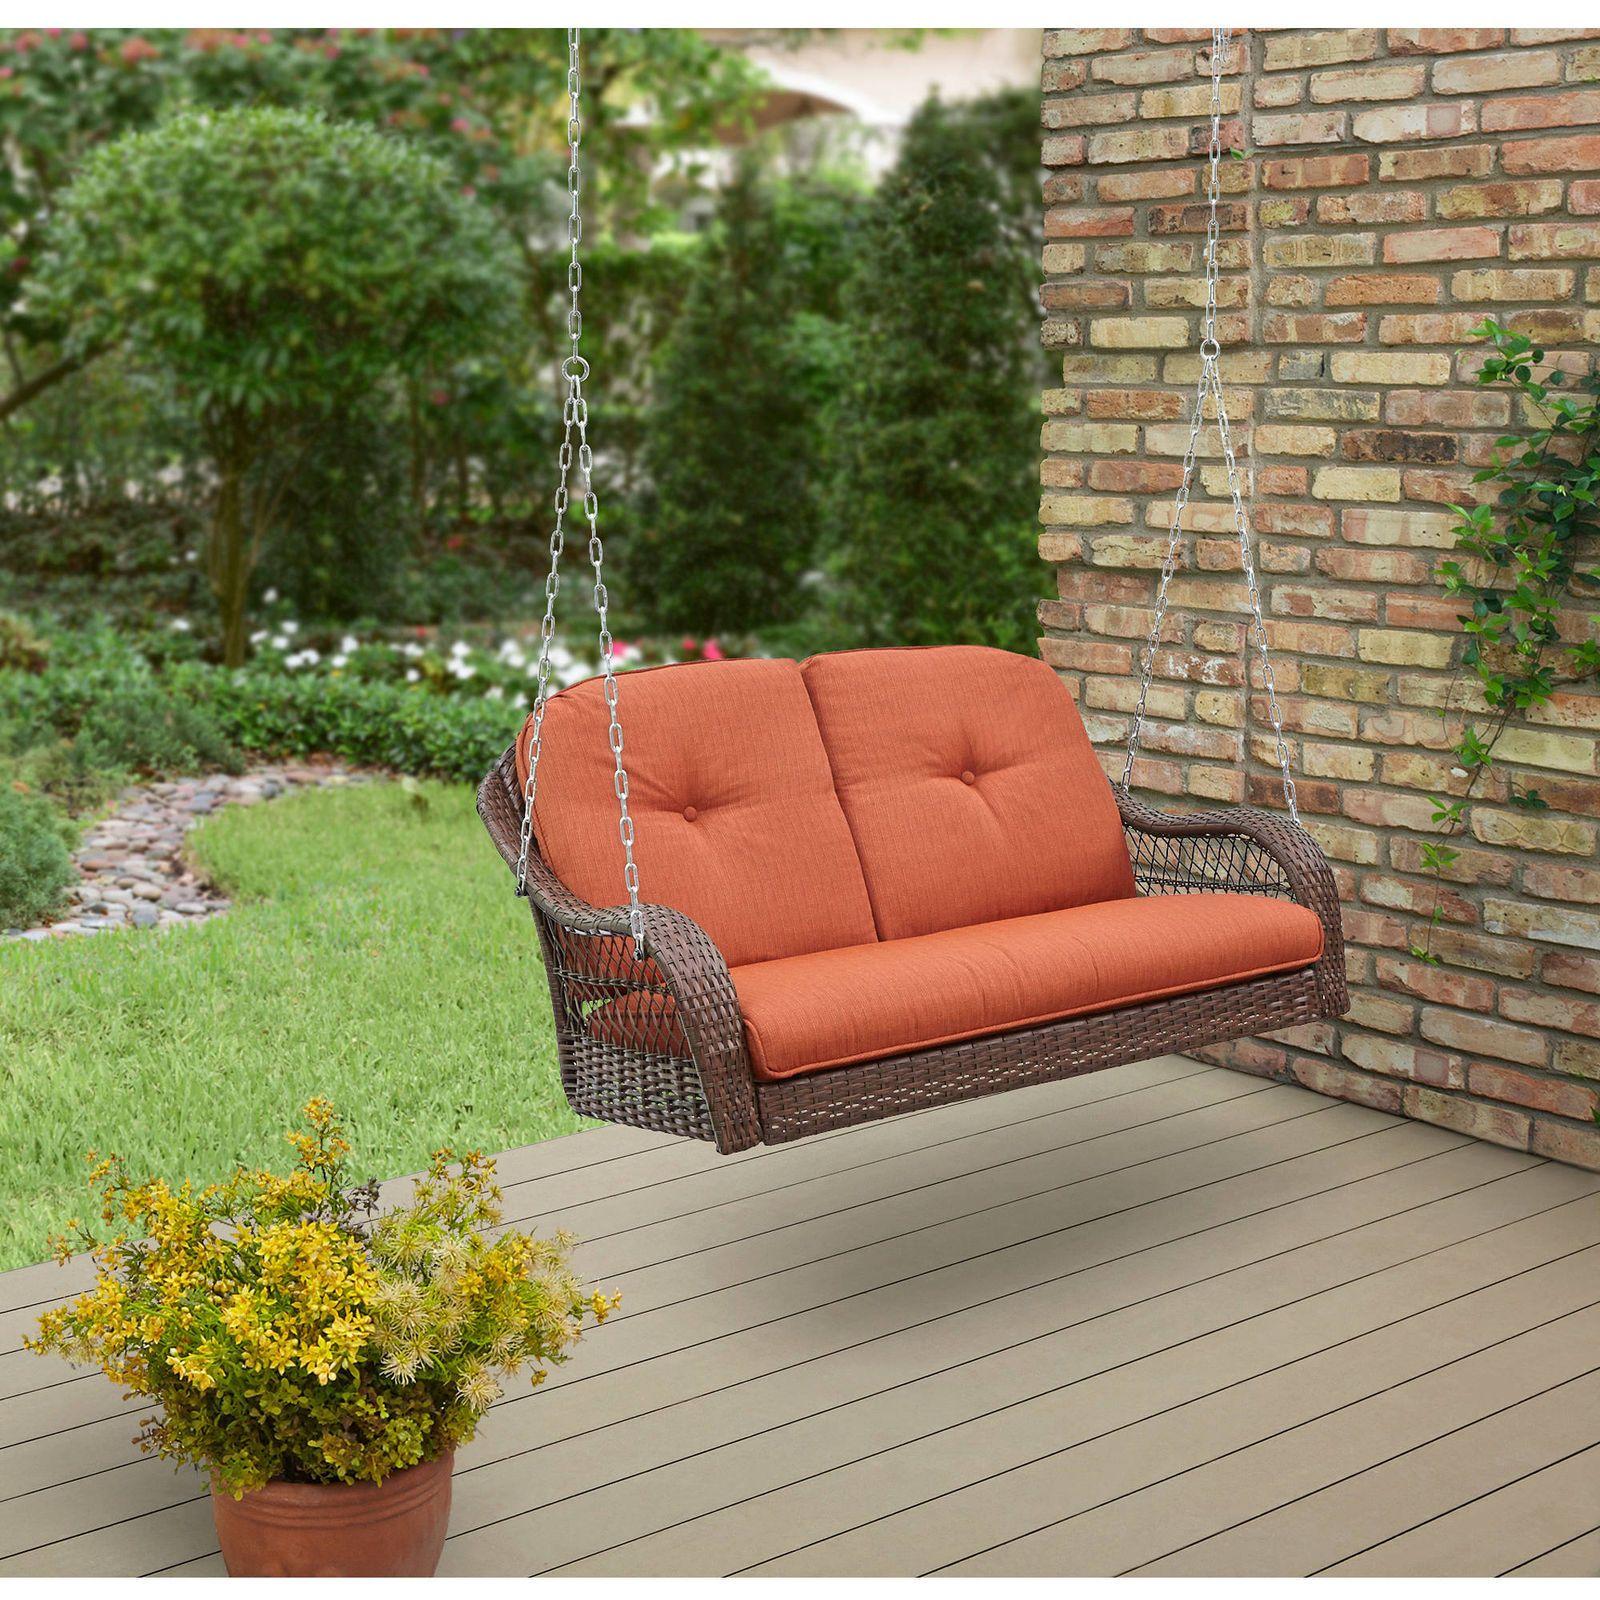 eBay SALES home_garden_discounts Wicker 3Seater Swing